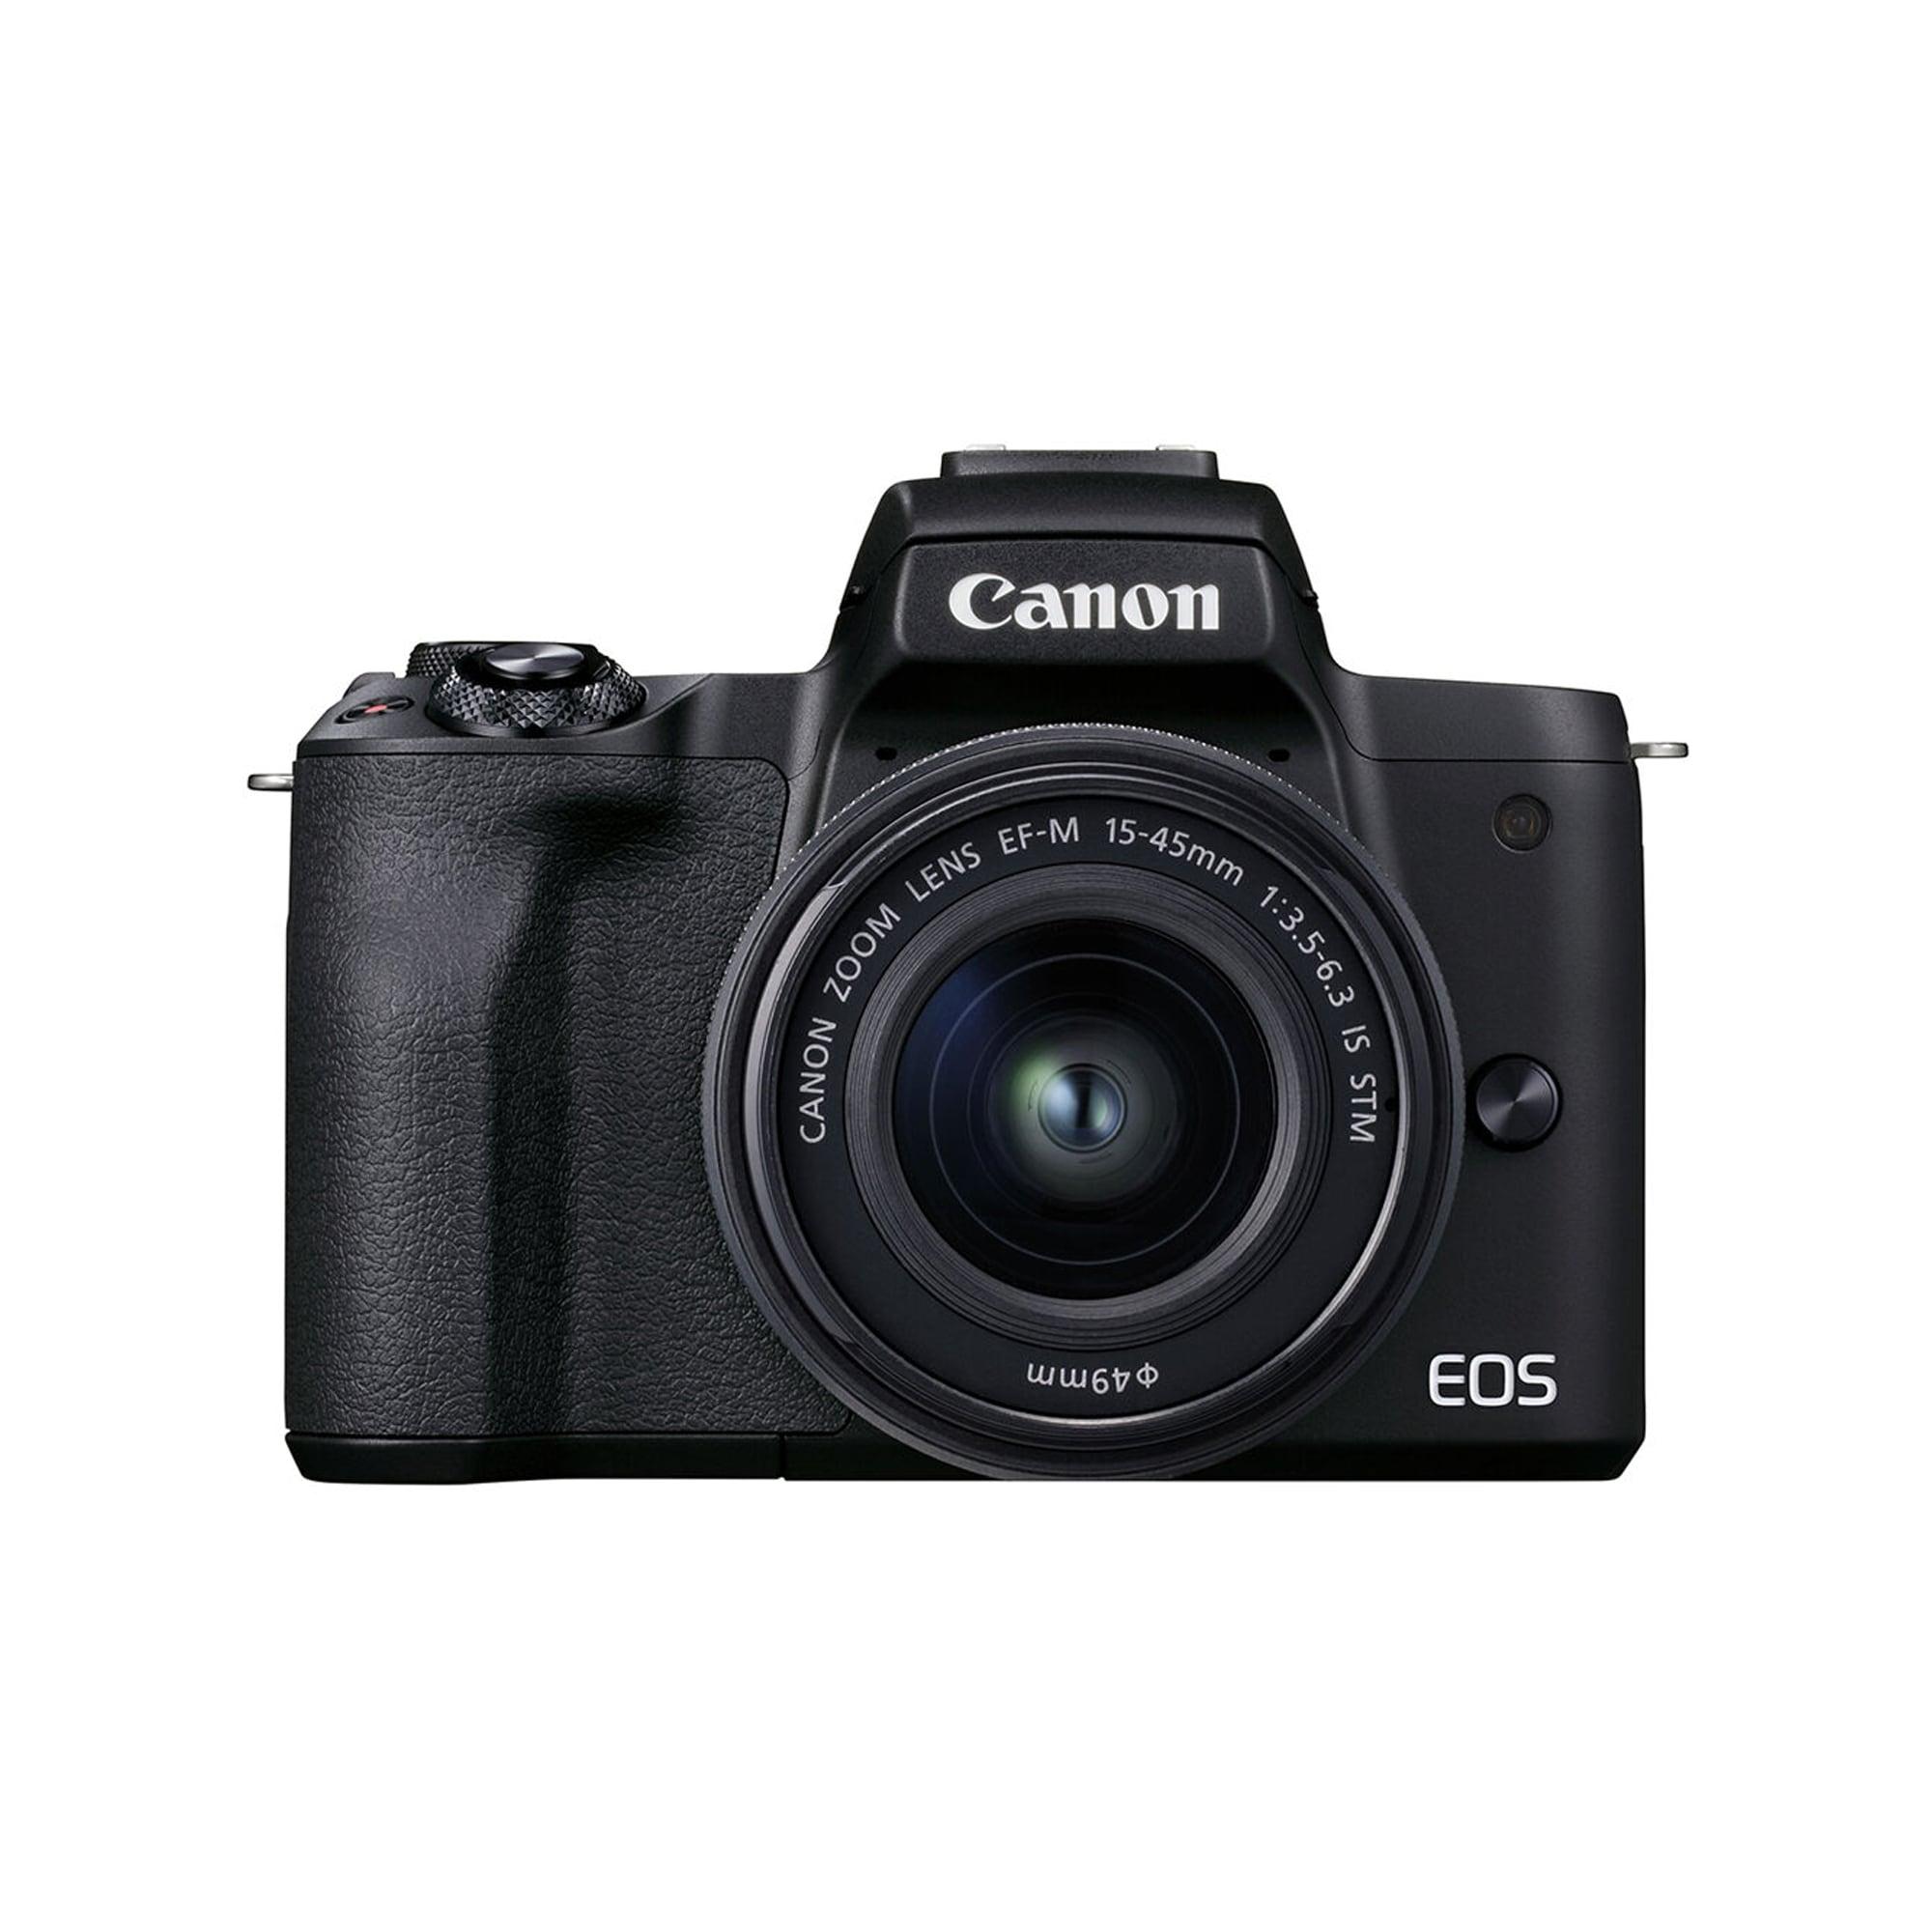 Canon EOS M50 Mark II svart kamerahus + EF-M 15-45/3,5-6,3 IS STM